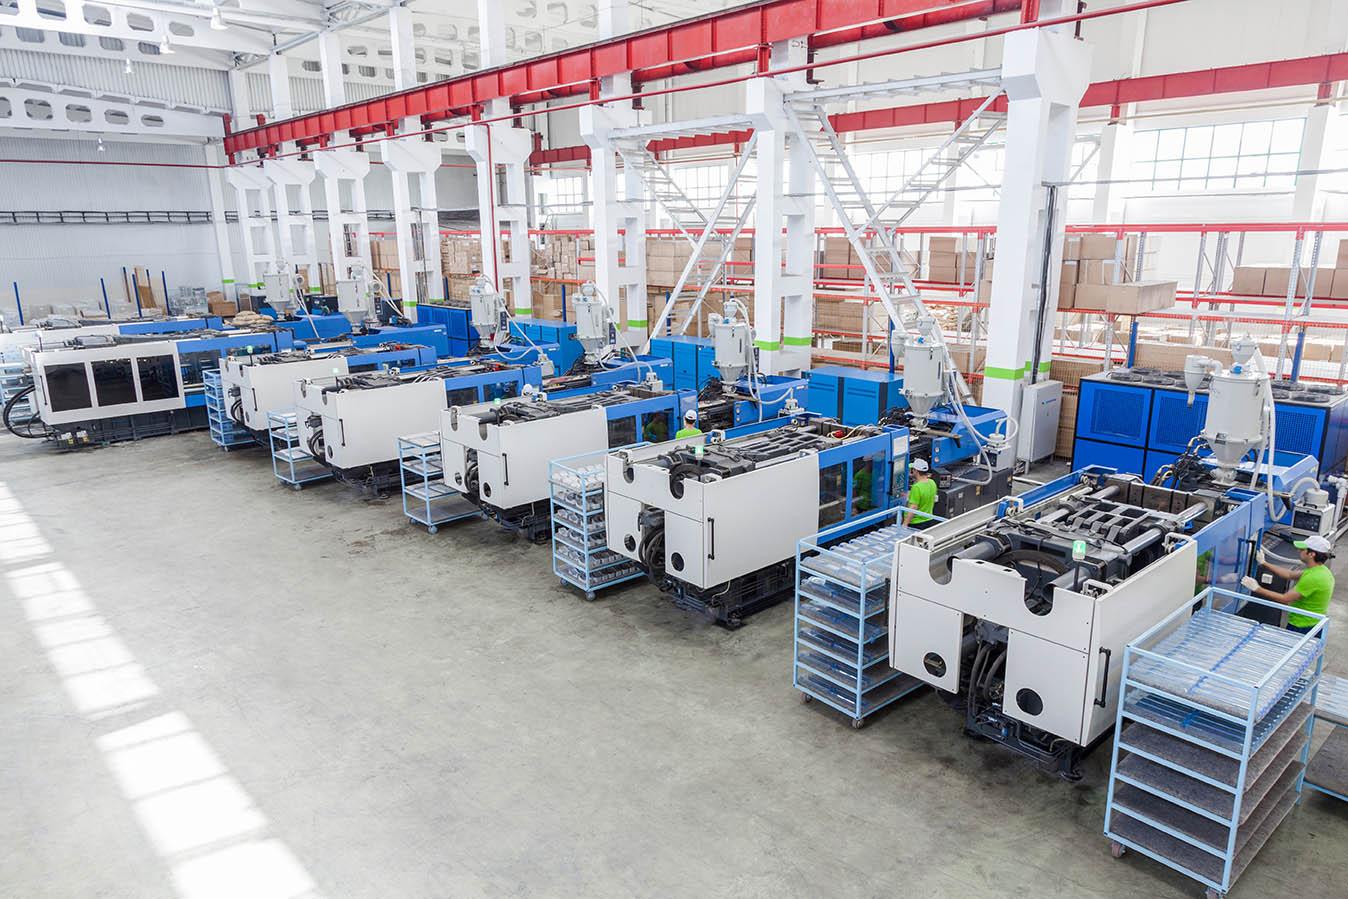 fastnet-service-facility-management-MVS-imm-1